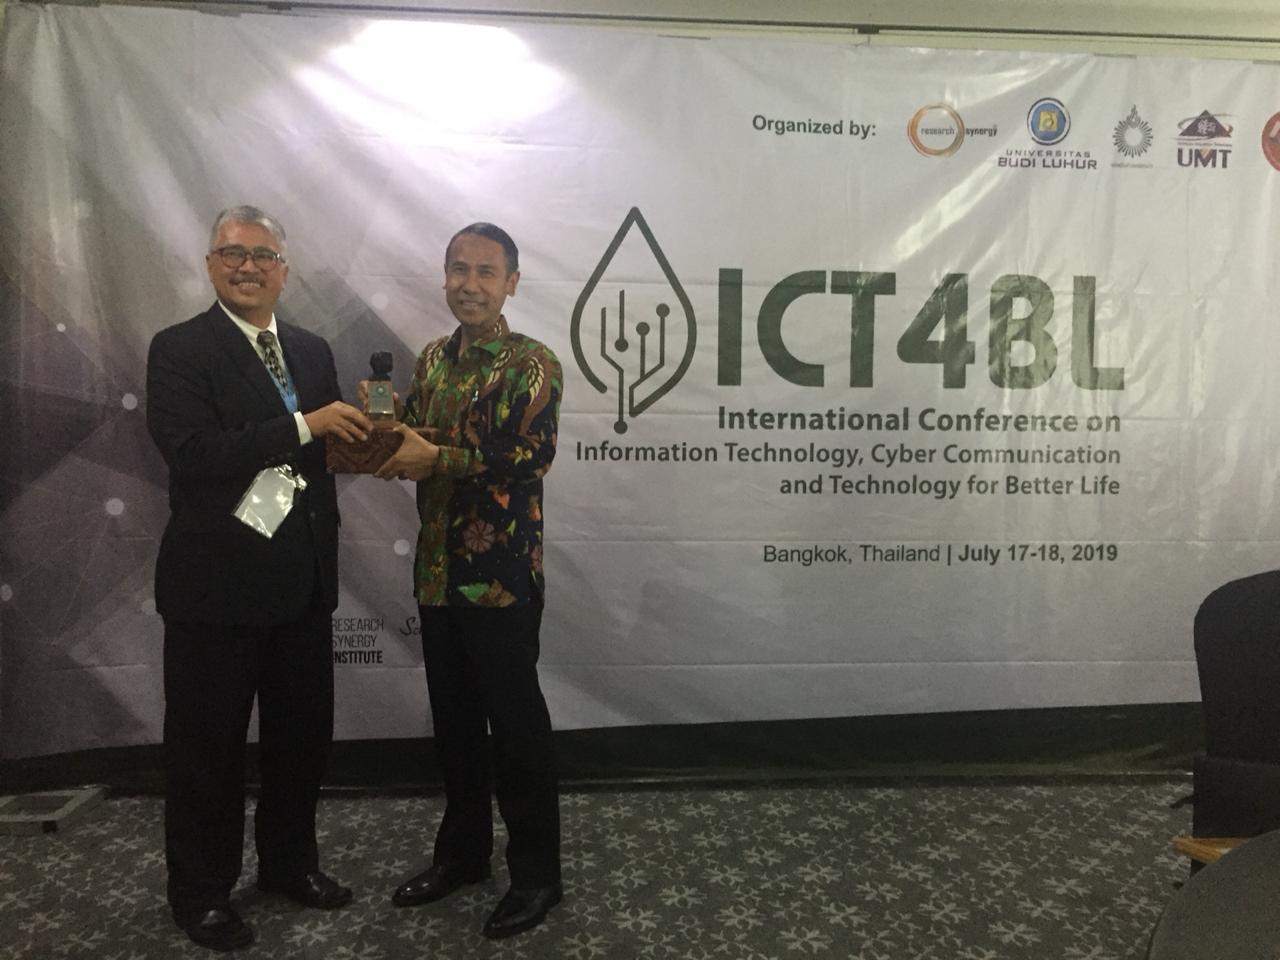 International Conference on IT, Communication and Technology for Better Life oleh Universitas Budi Luhur di Bangkok, Thailand